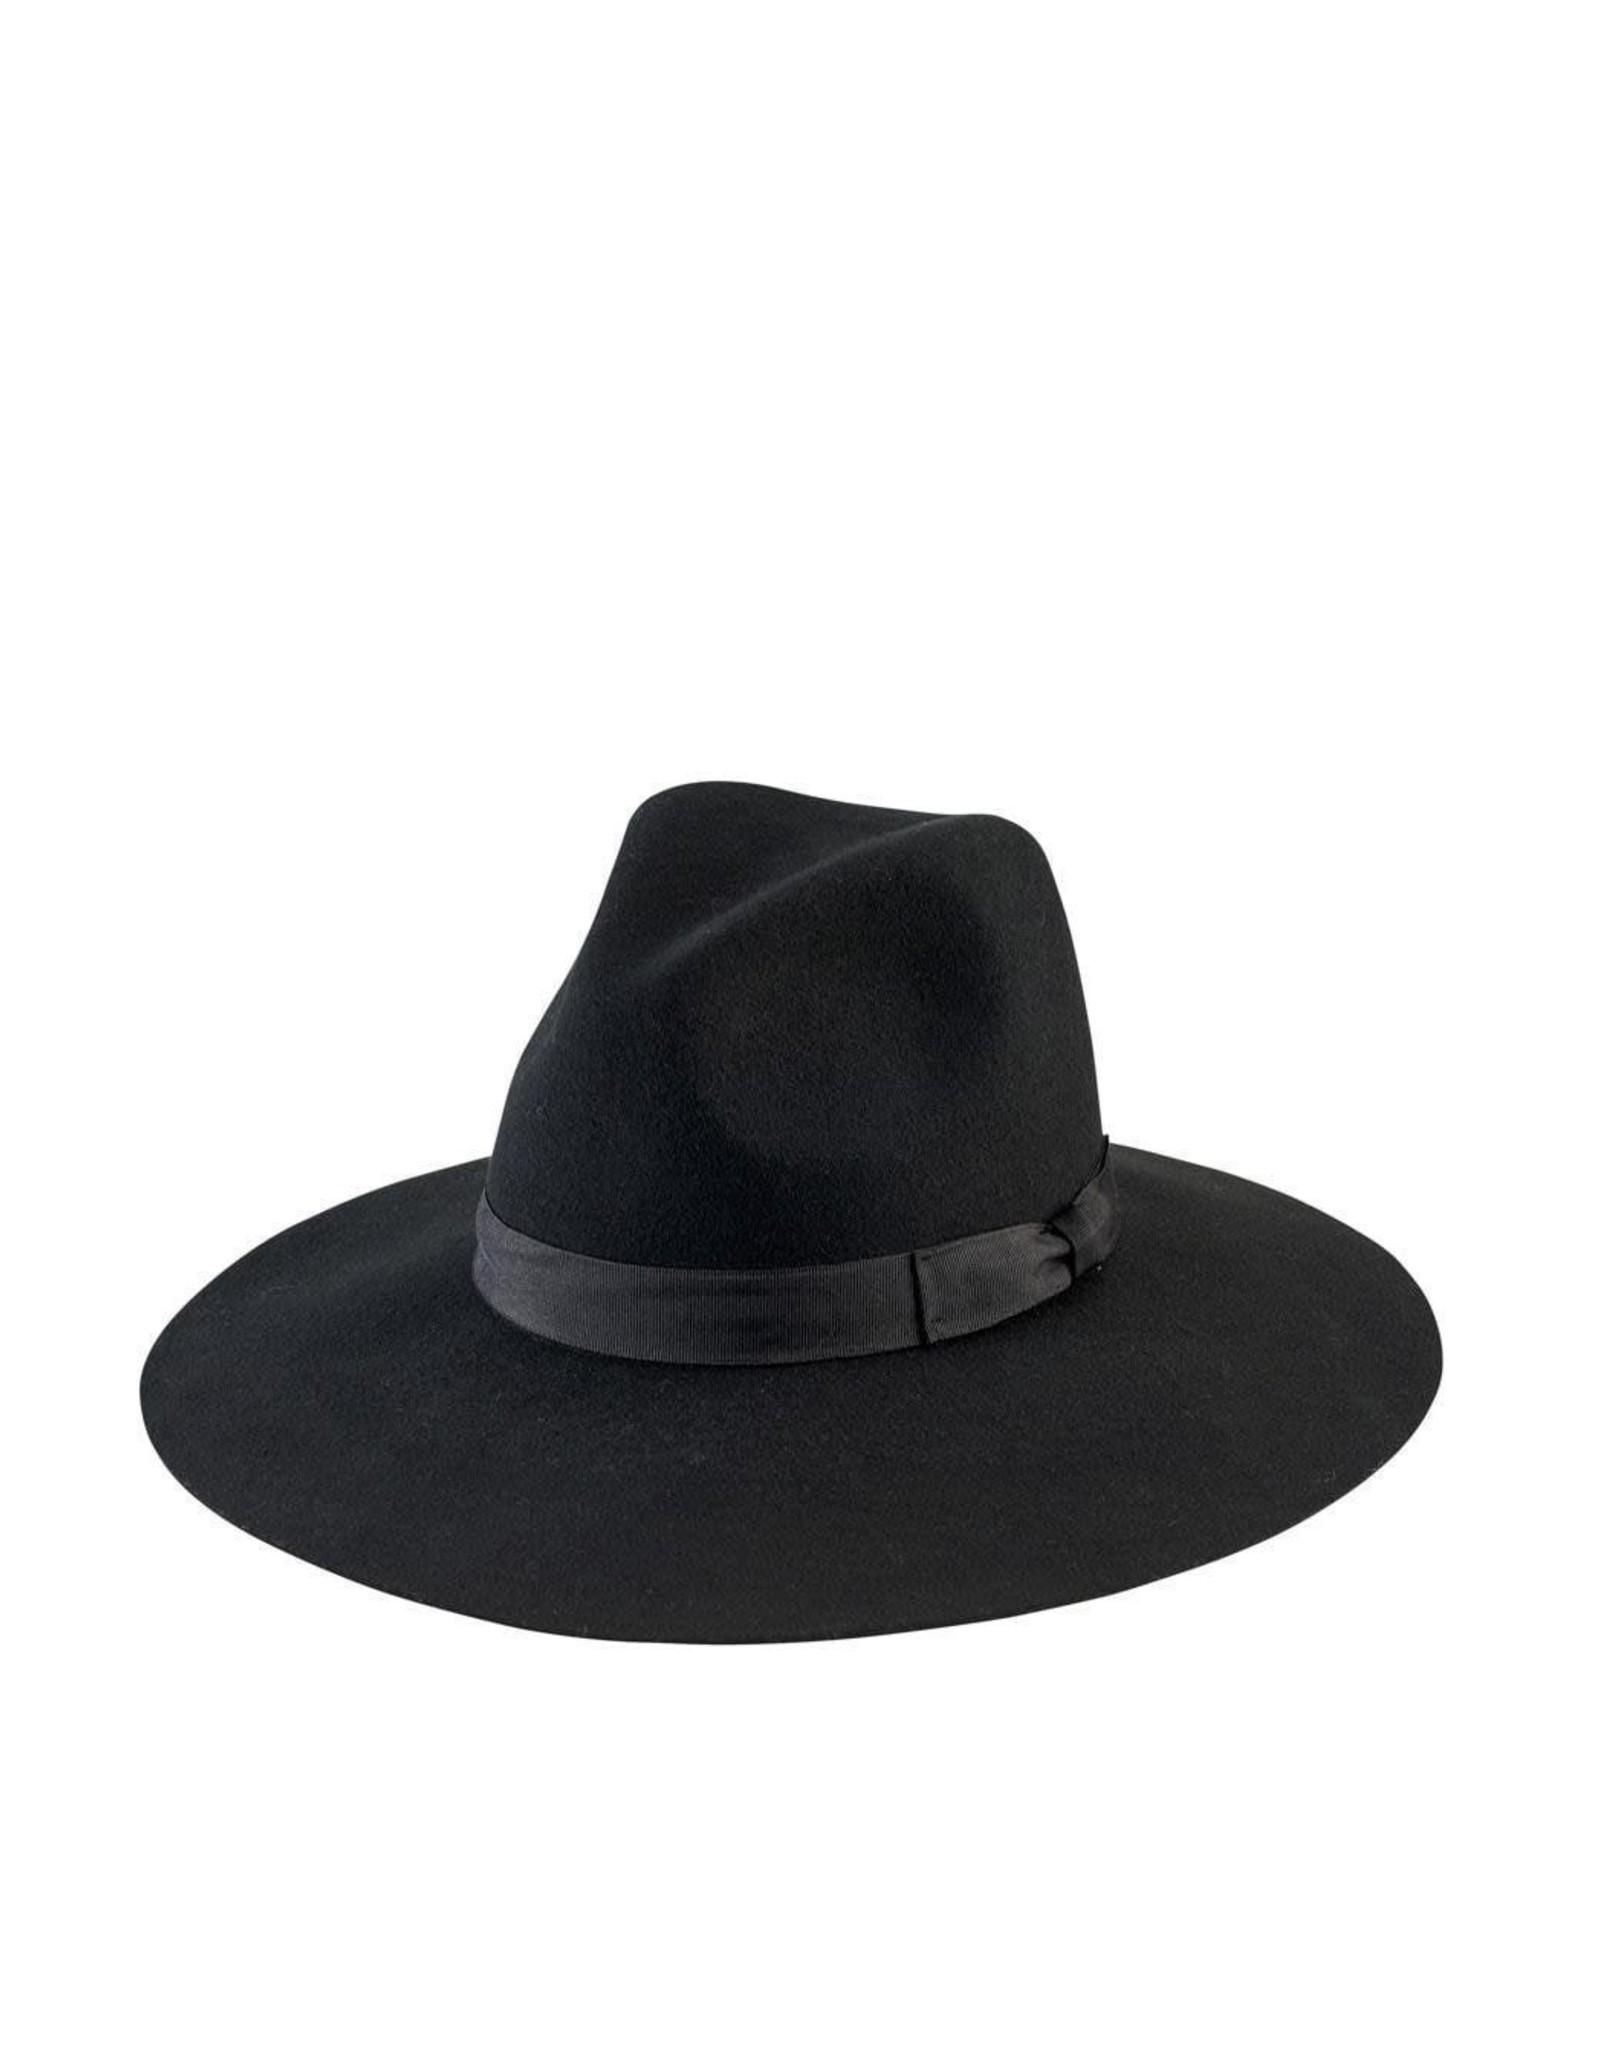 HAT-FEDORA-BIG BRIM